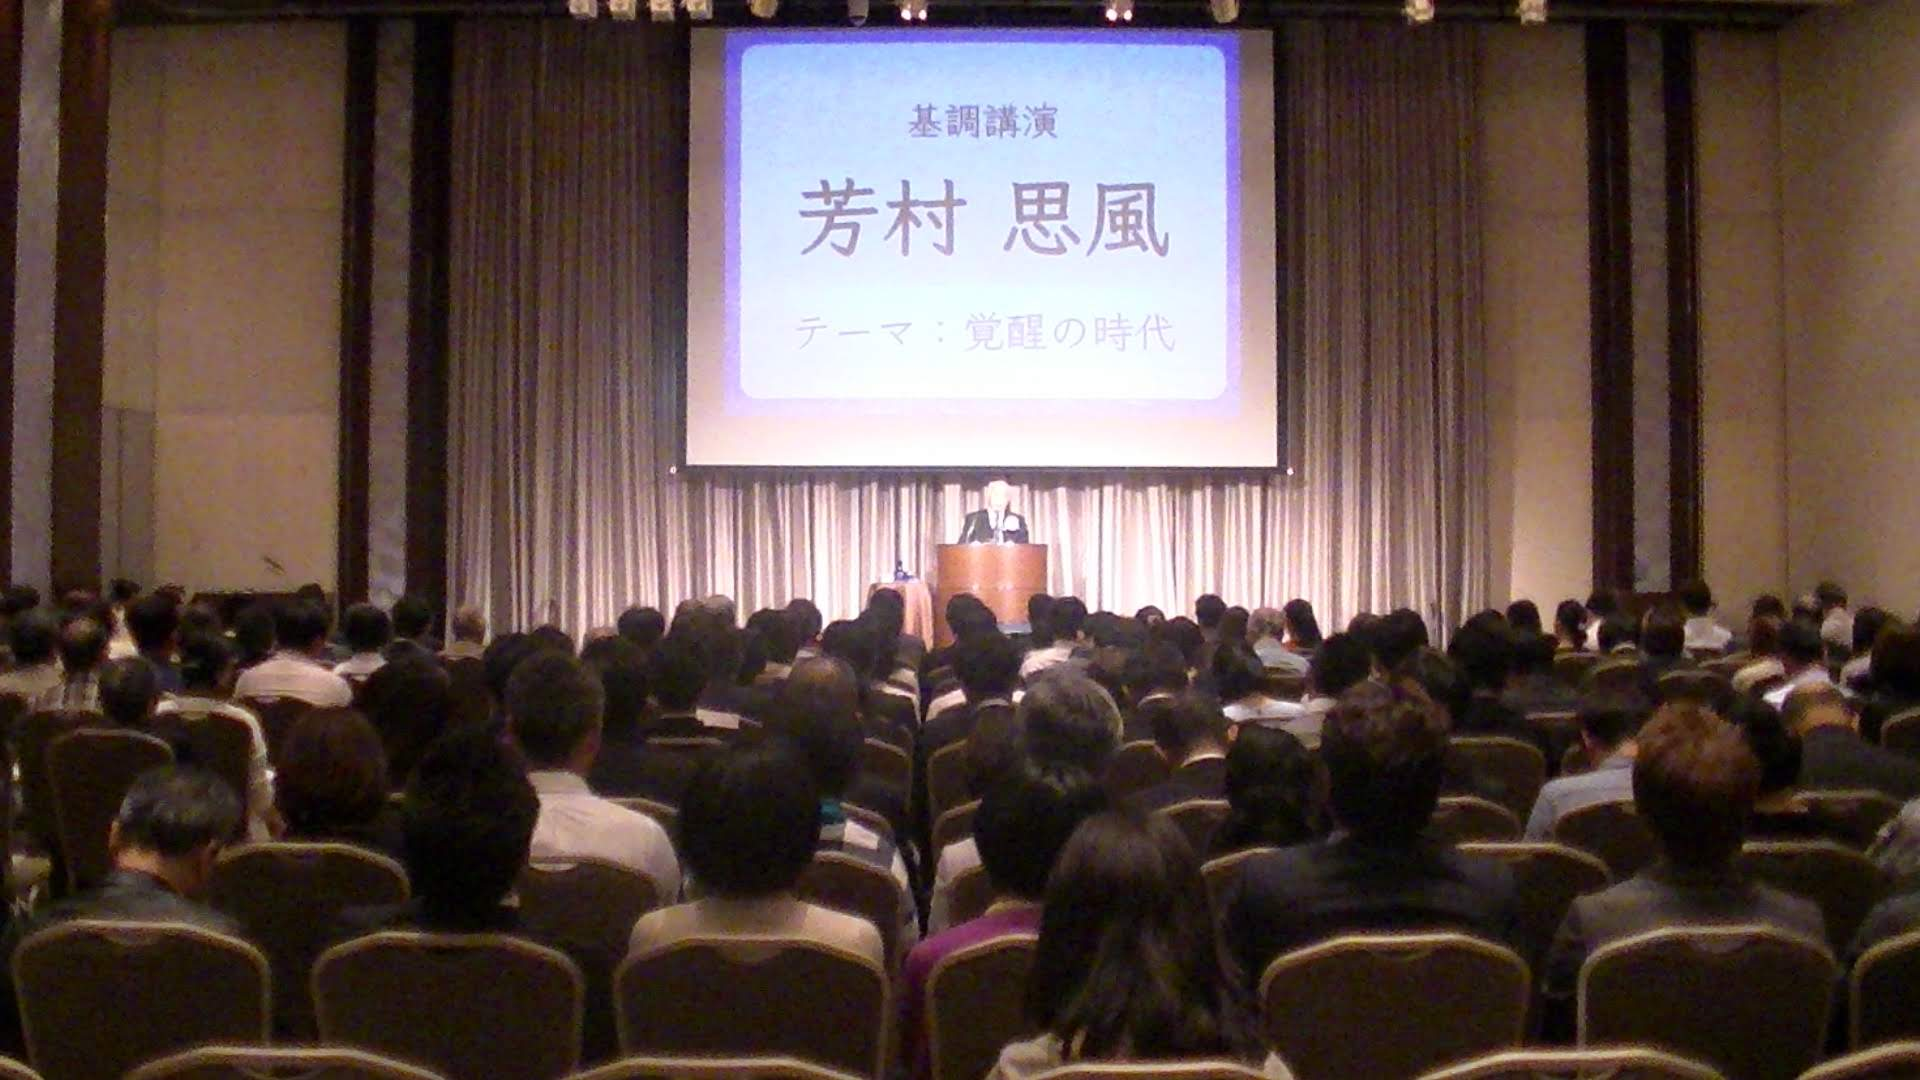 PIC 1656 1 - 思風会全国大会in広島